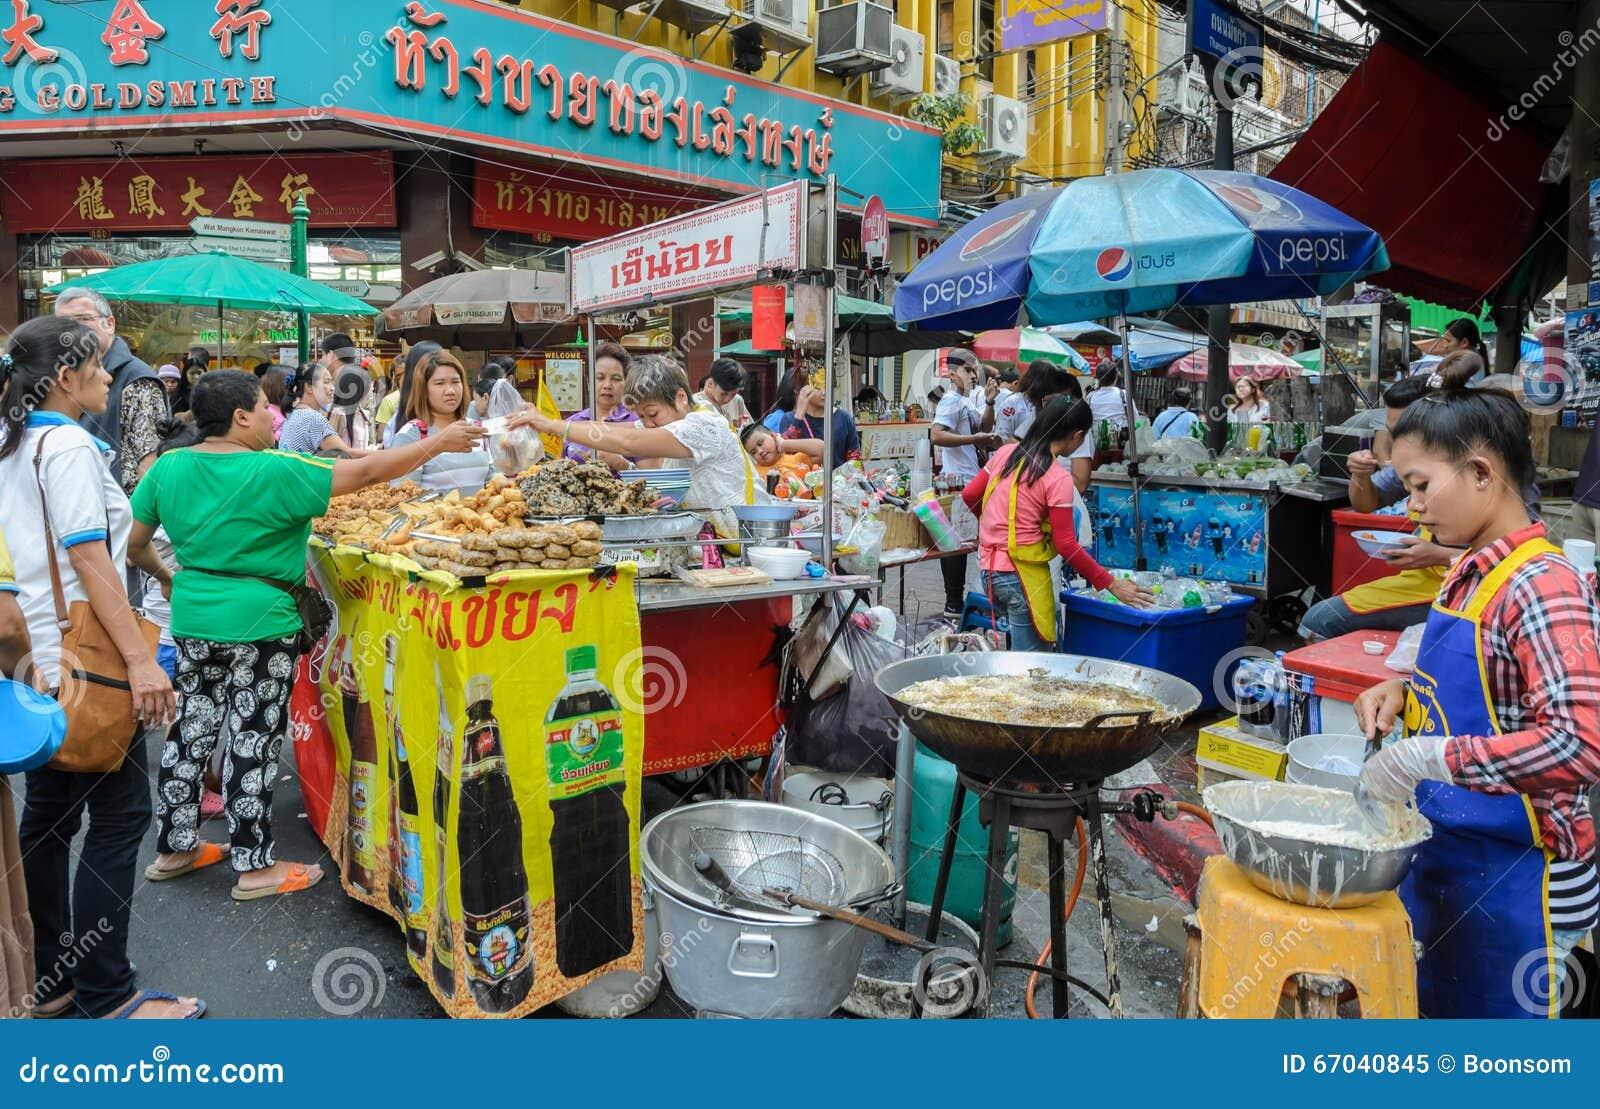 Chinatown street food market in Bangkok, Thailand